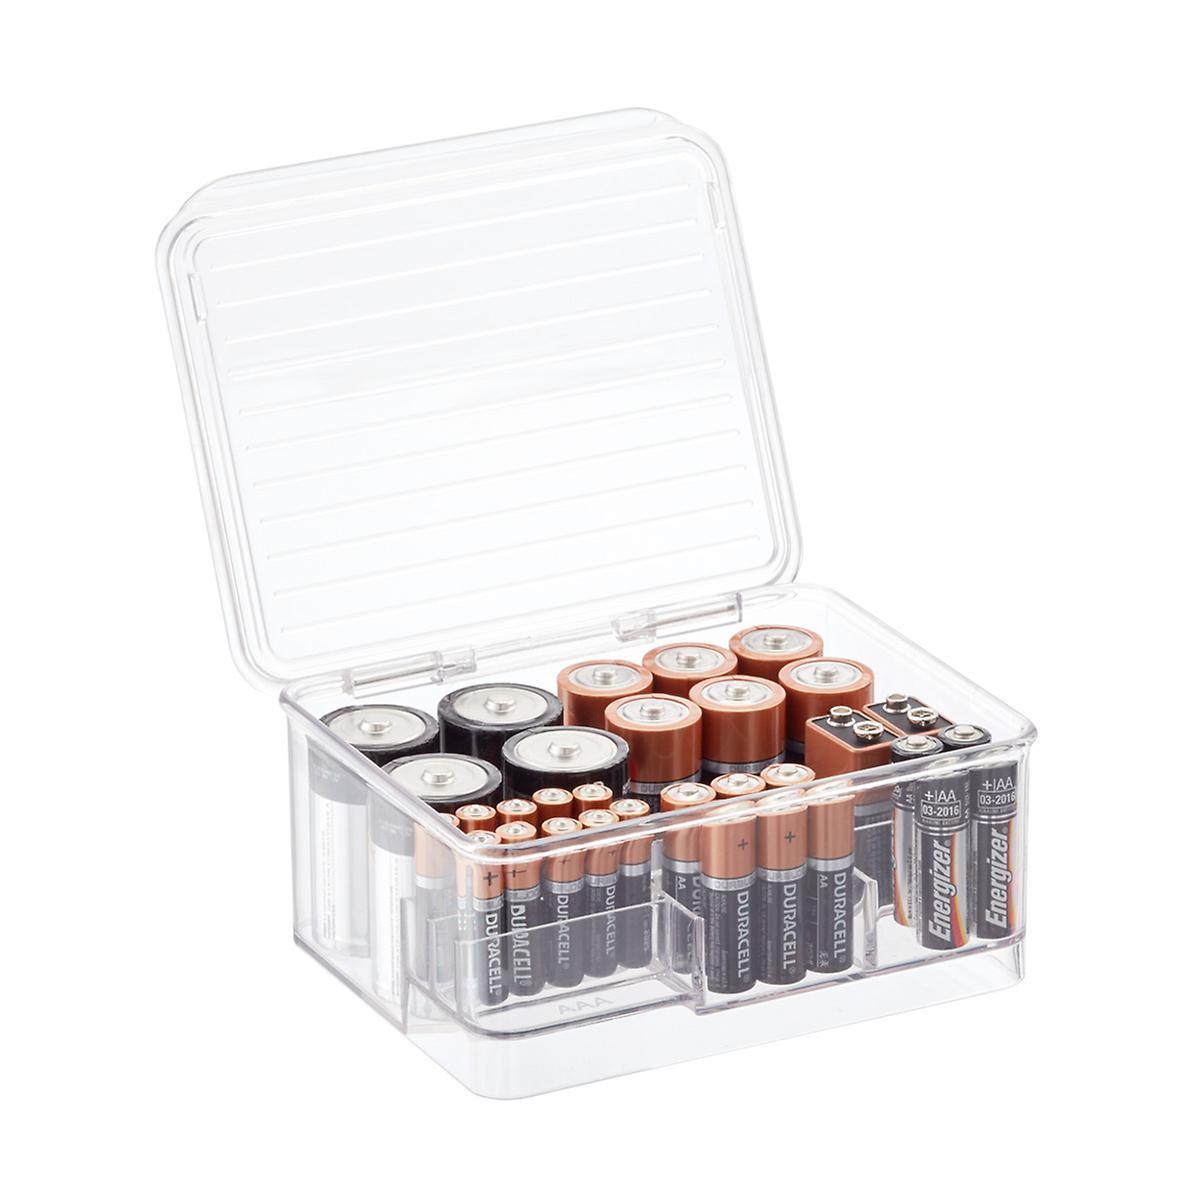 10073695-linus-battery-organizer.jpg